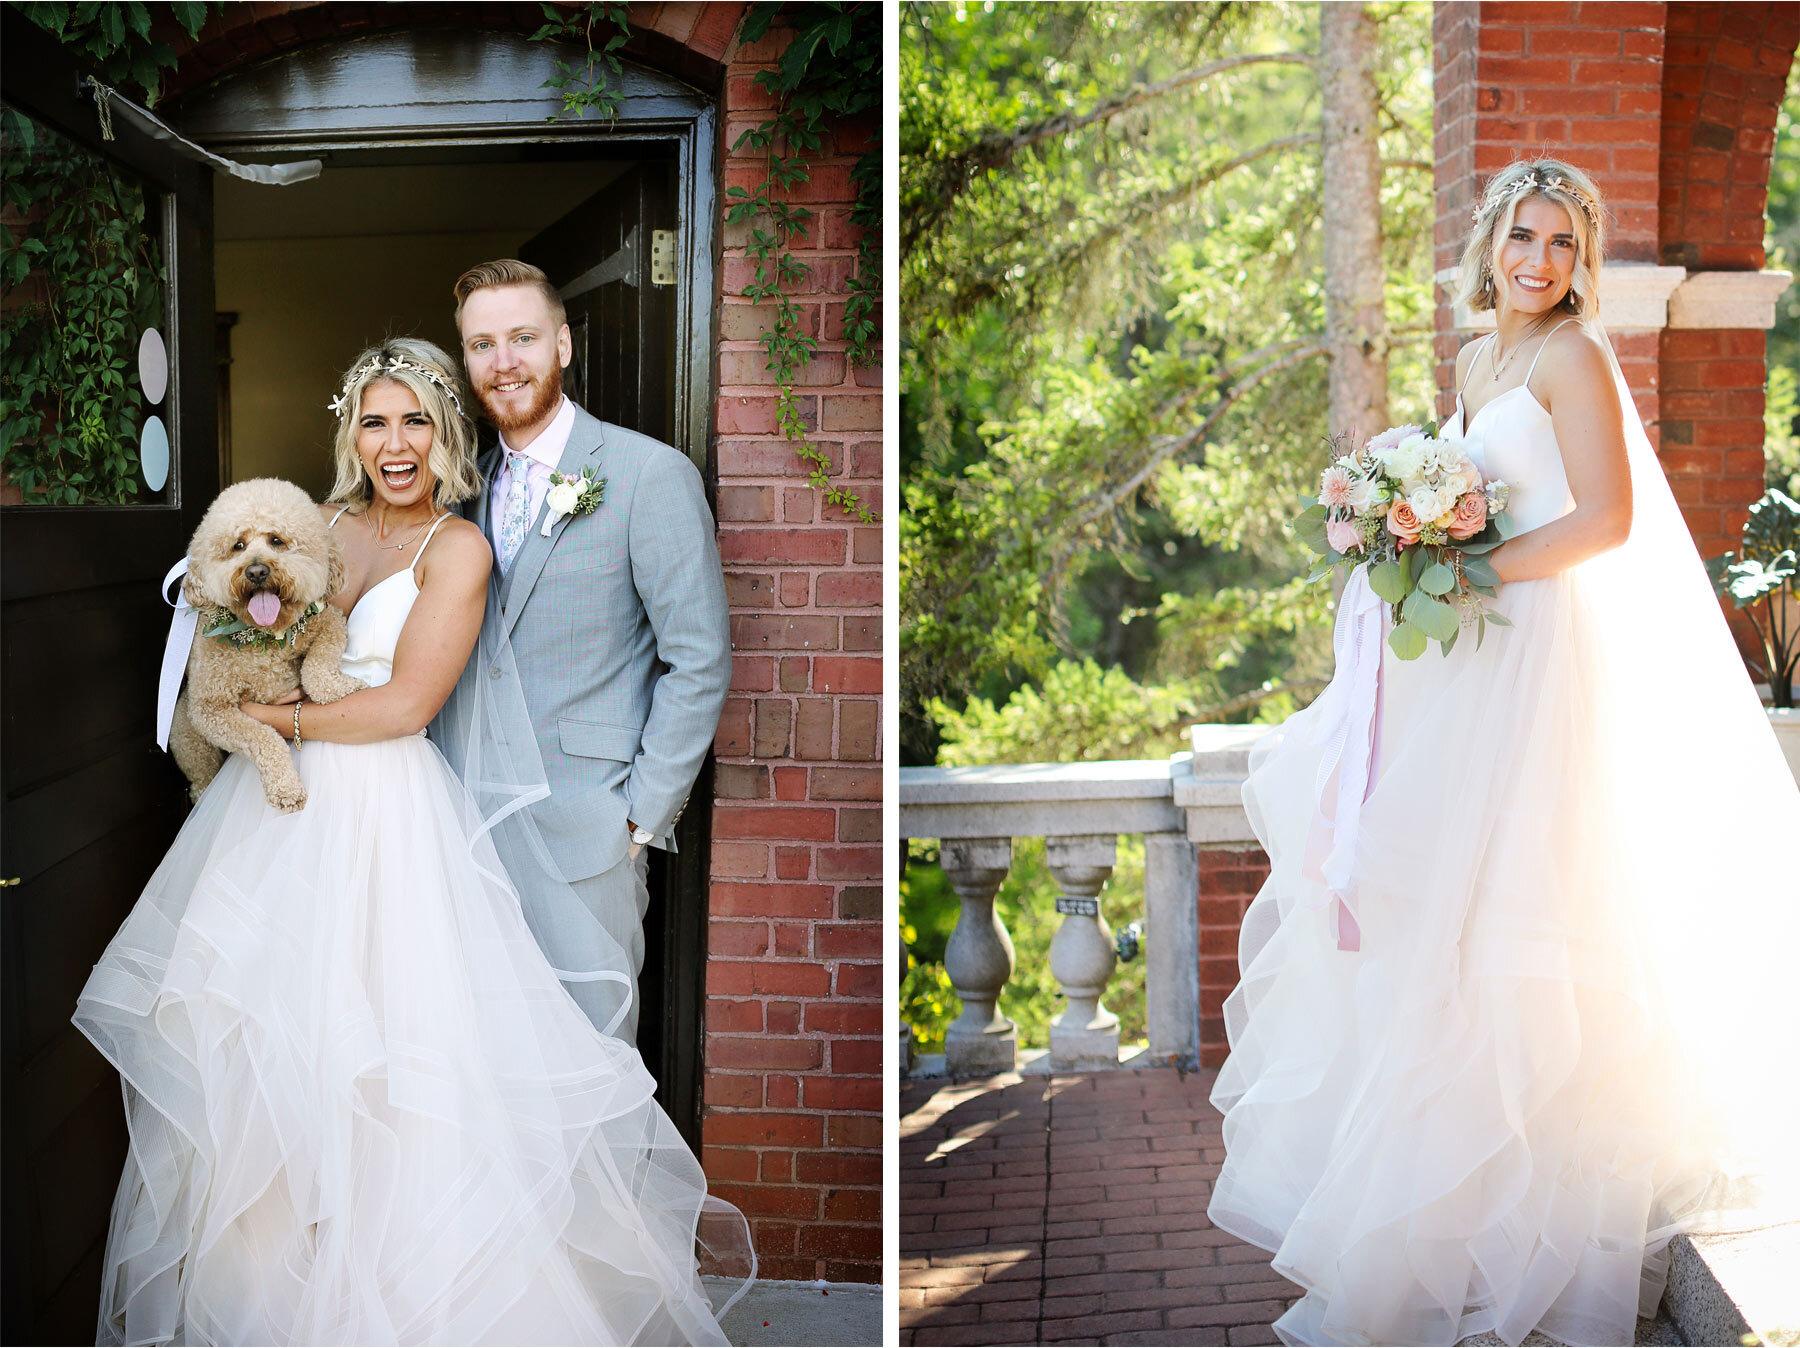 13-Vick-Photography-Wedding-Duluth-Minnesota-Glensheen-Mansion-Groom-Bride-Dog-Catherine-and-John.jpg